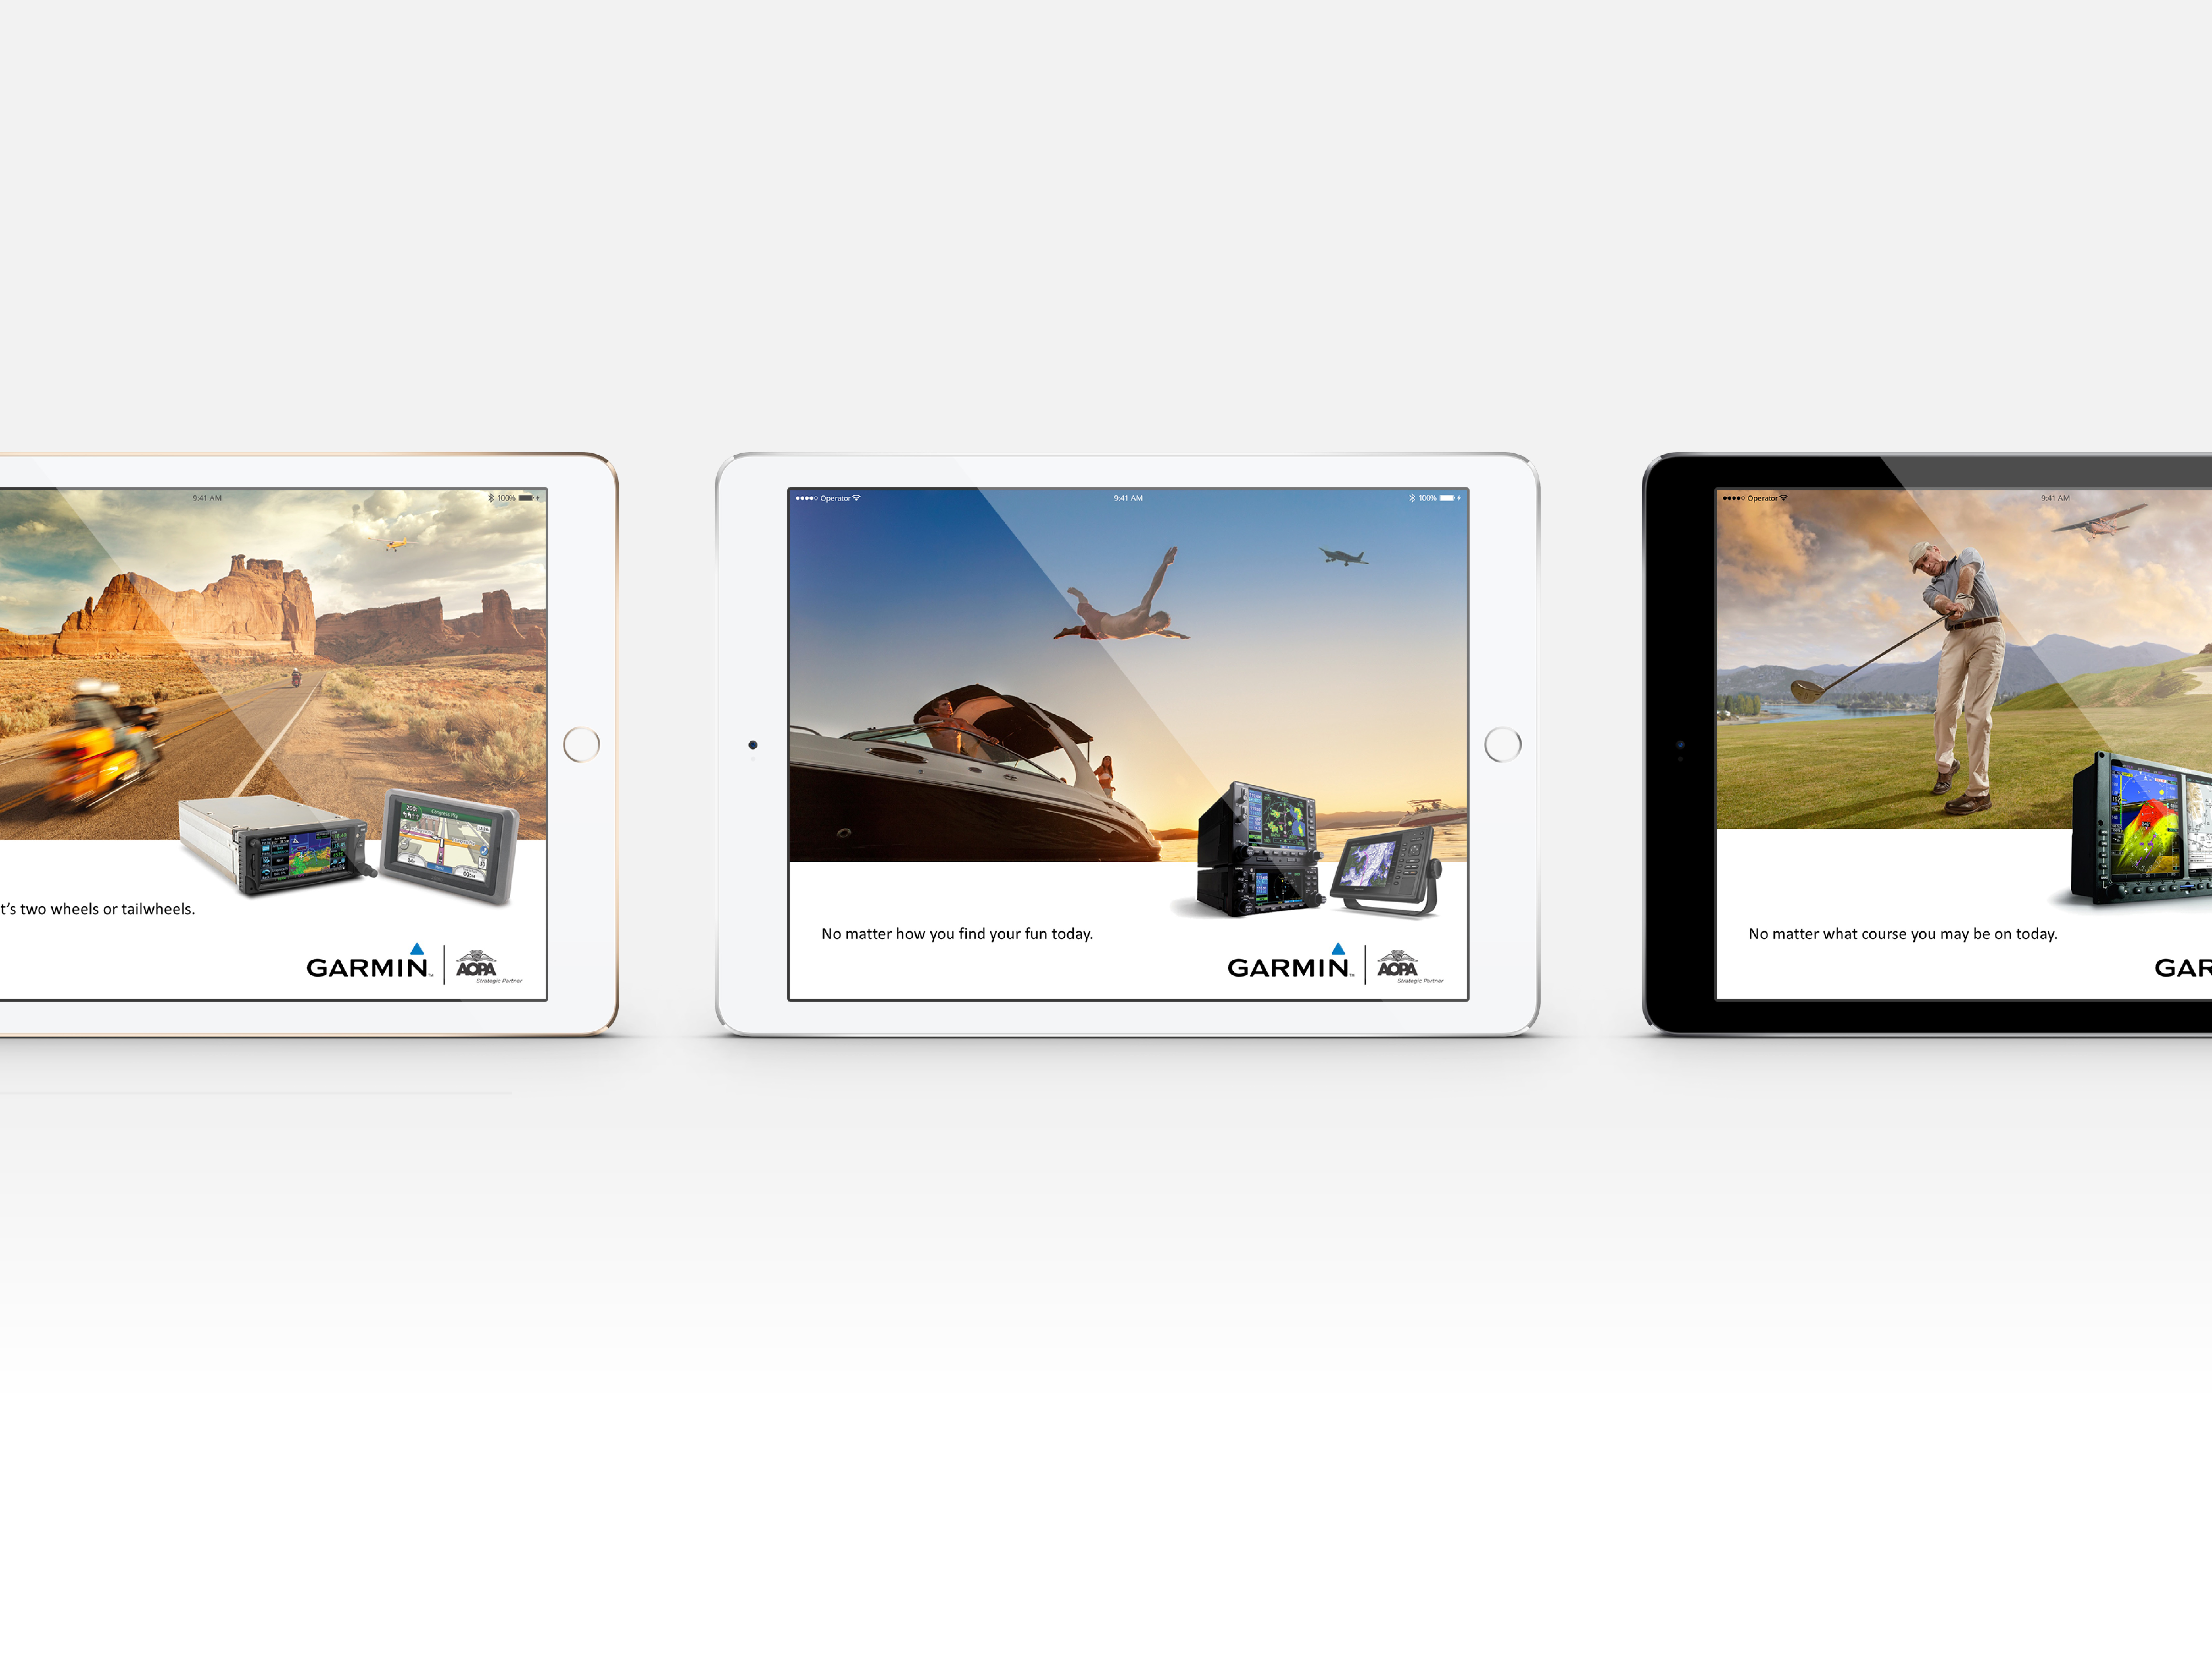 Garmin Digital Ad Campaign